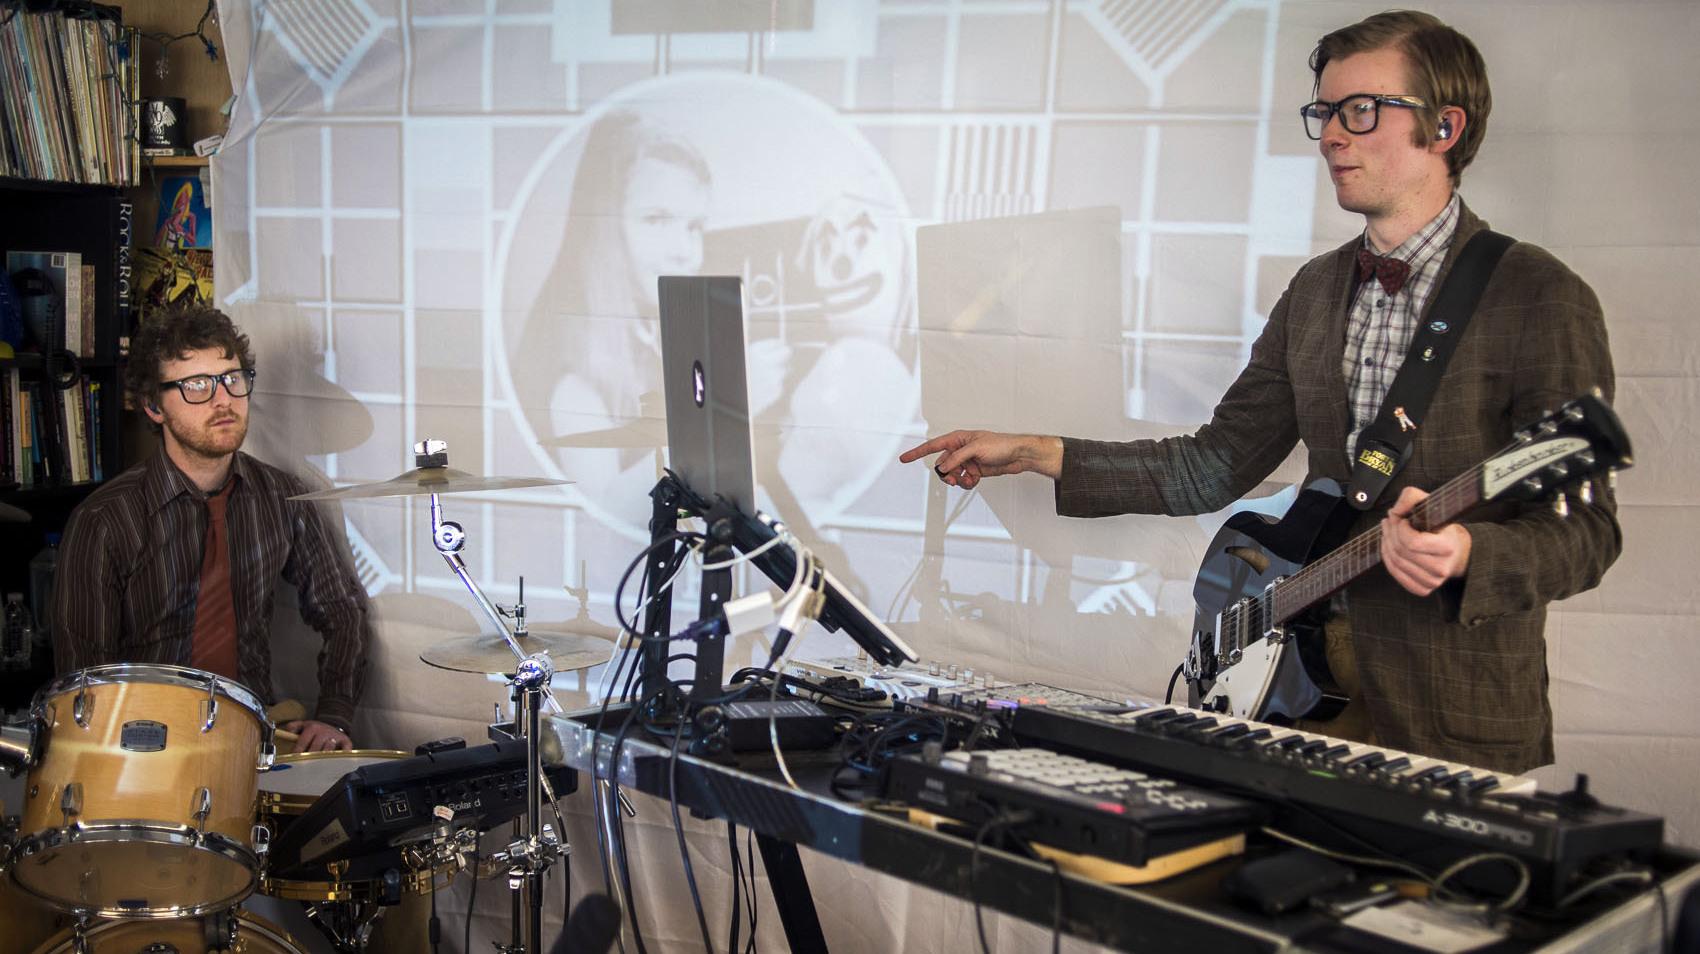 Andrea Echeverri: Public Service Broadcasting: Tiny Desk Concert : NPR